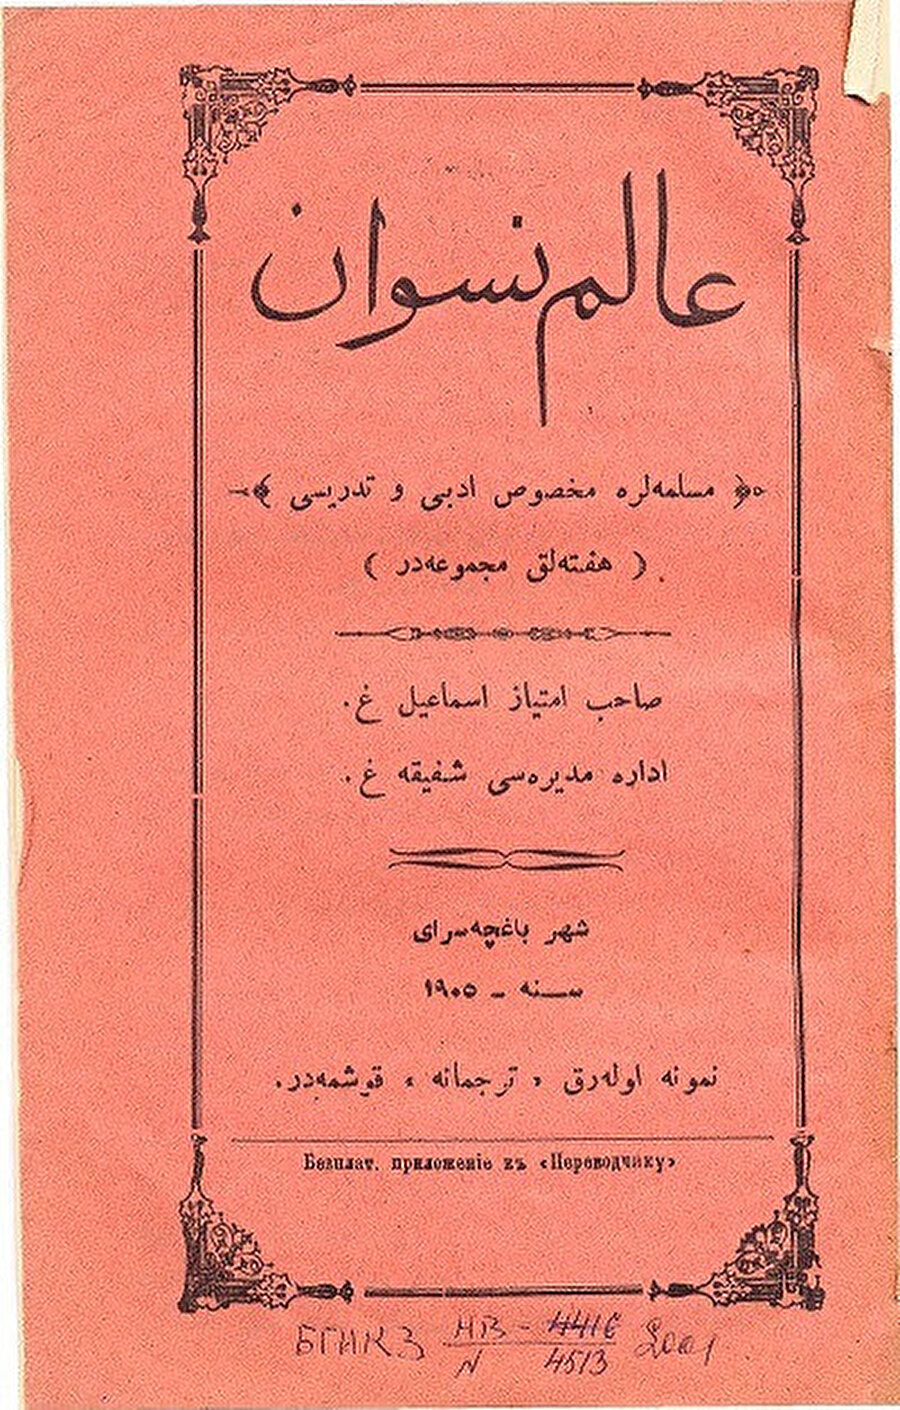 Alem-i Nisvan dergisinin kapağı. (1906-1912)